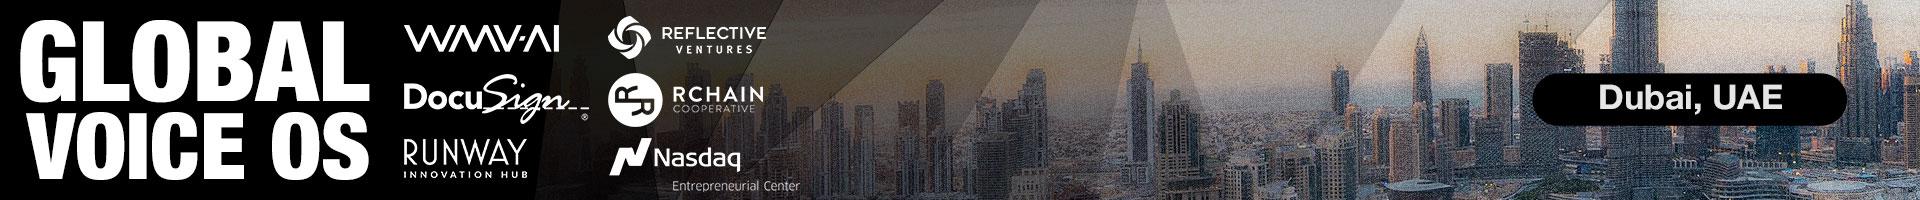 Event-Global-Voice-OS-1920x200-Dubai-UAE